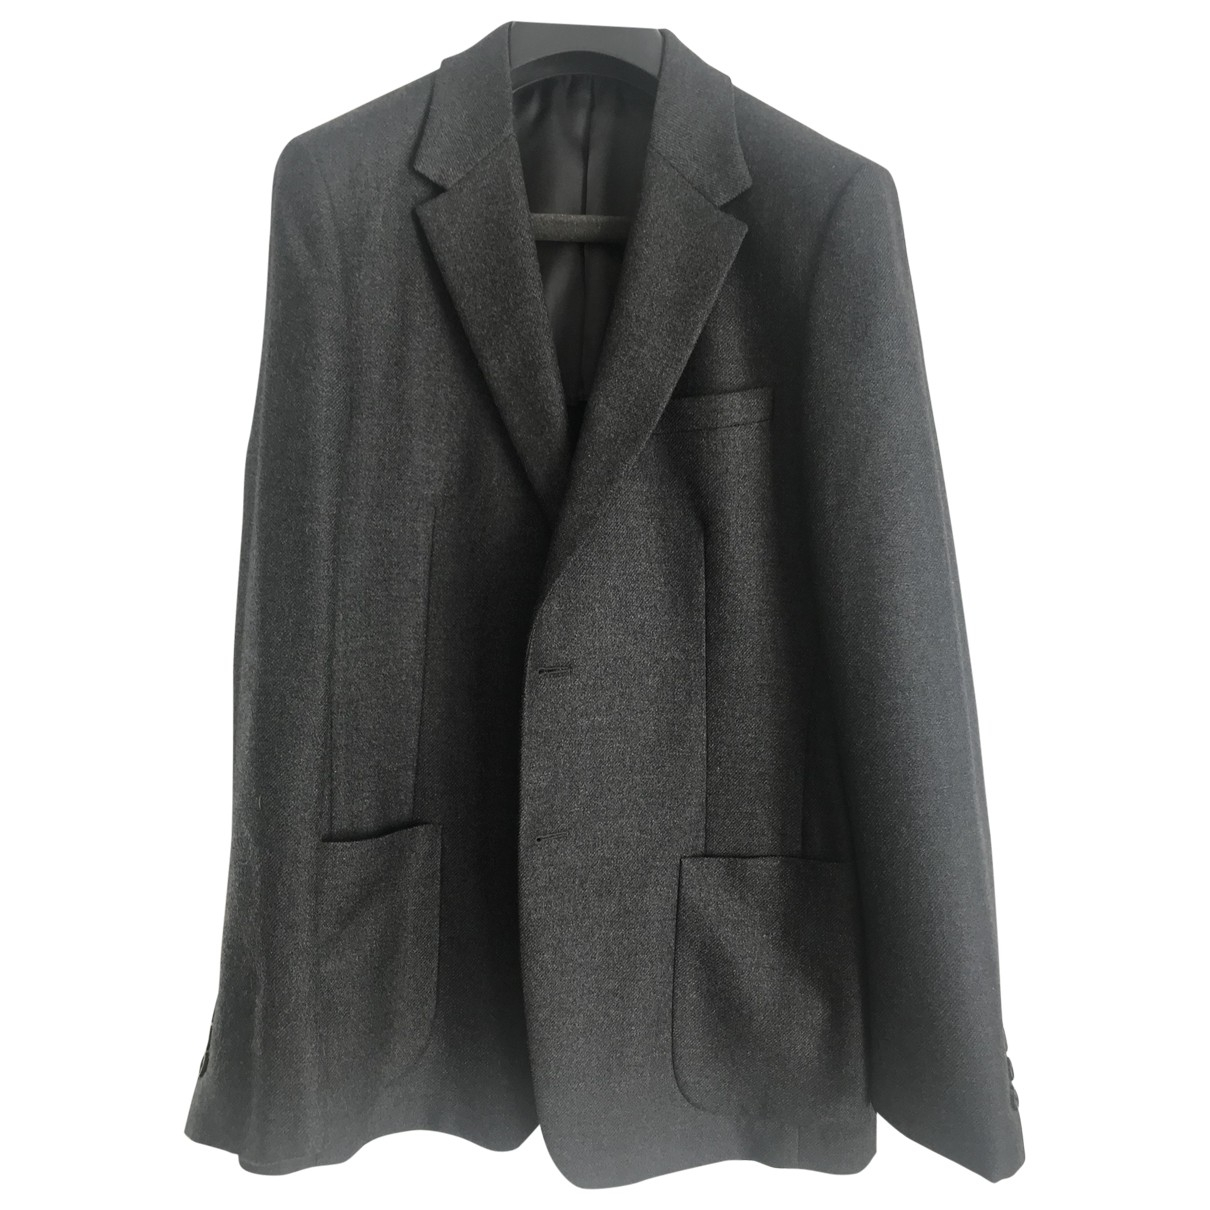 Prada \N Jacke in  Grau Wolle